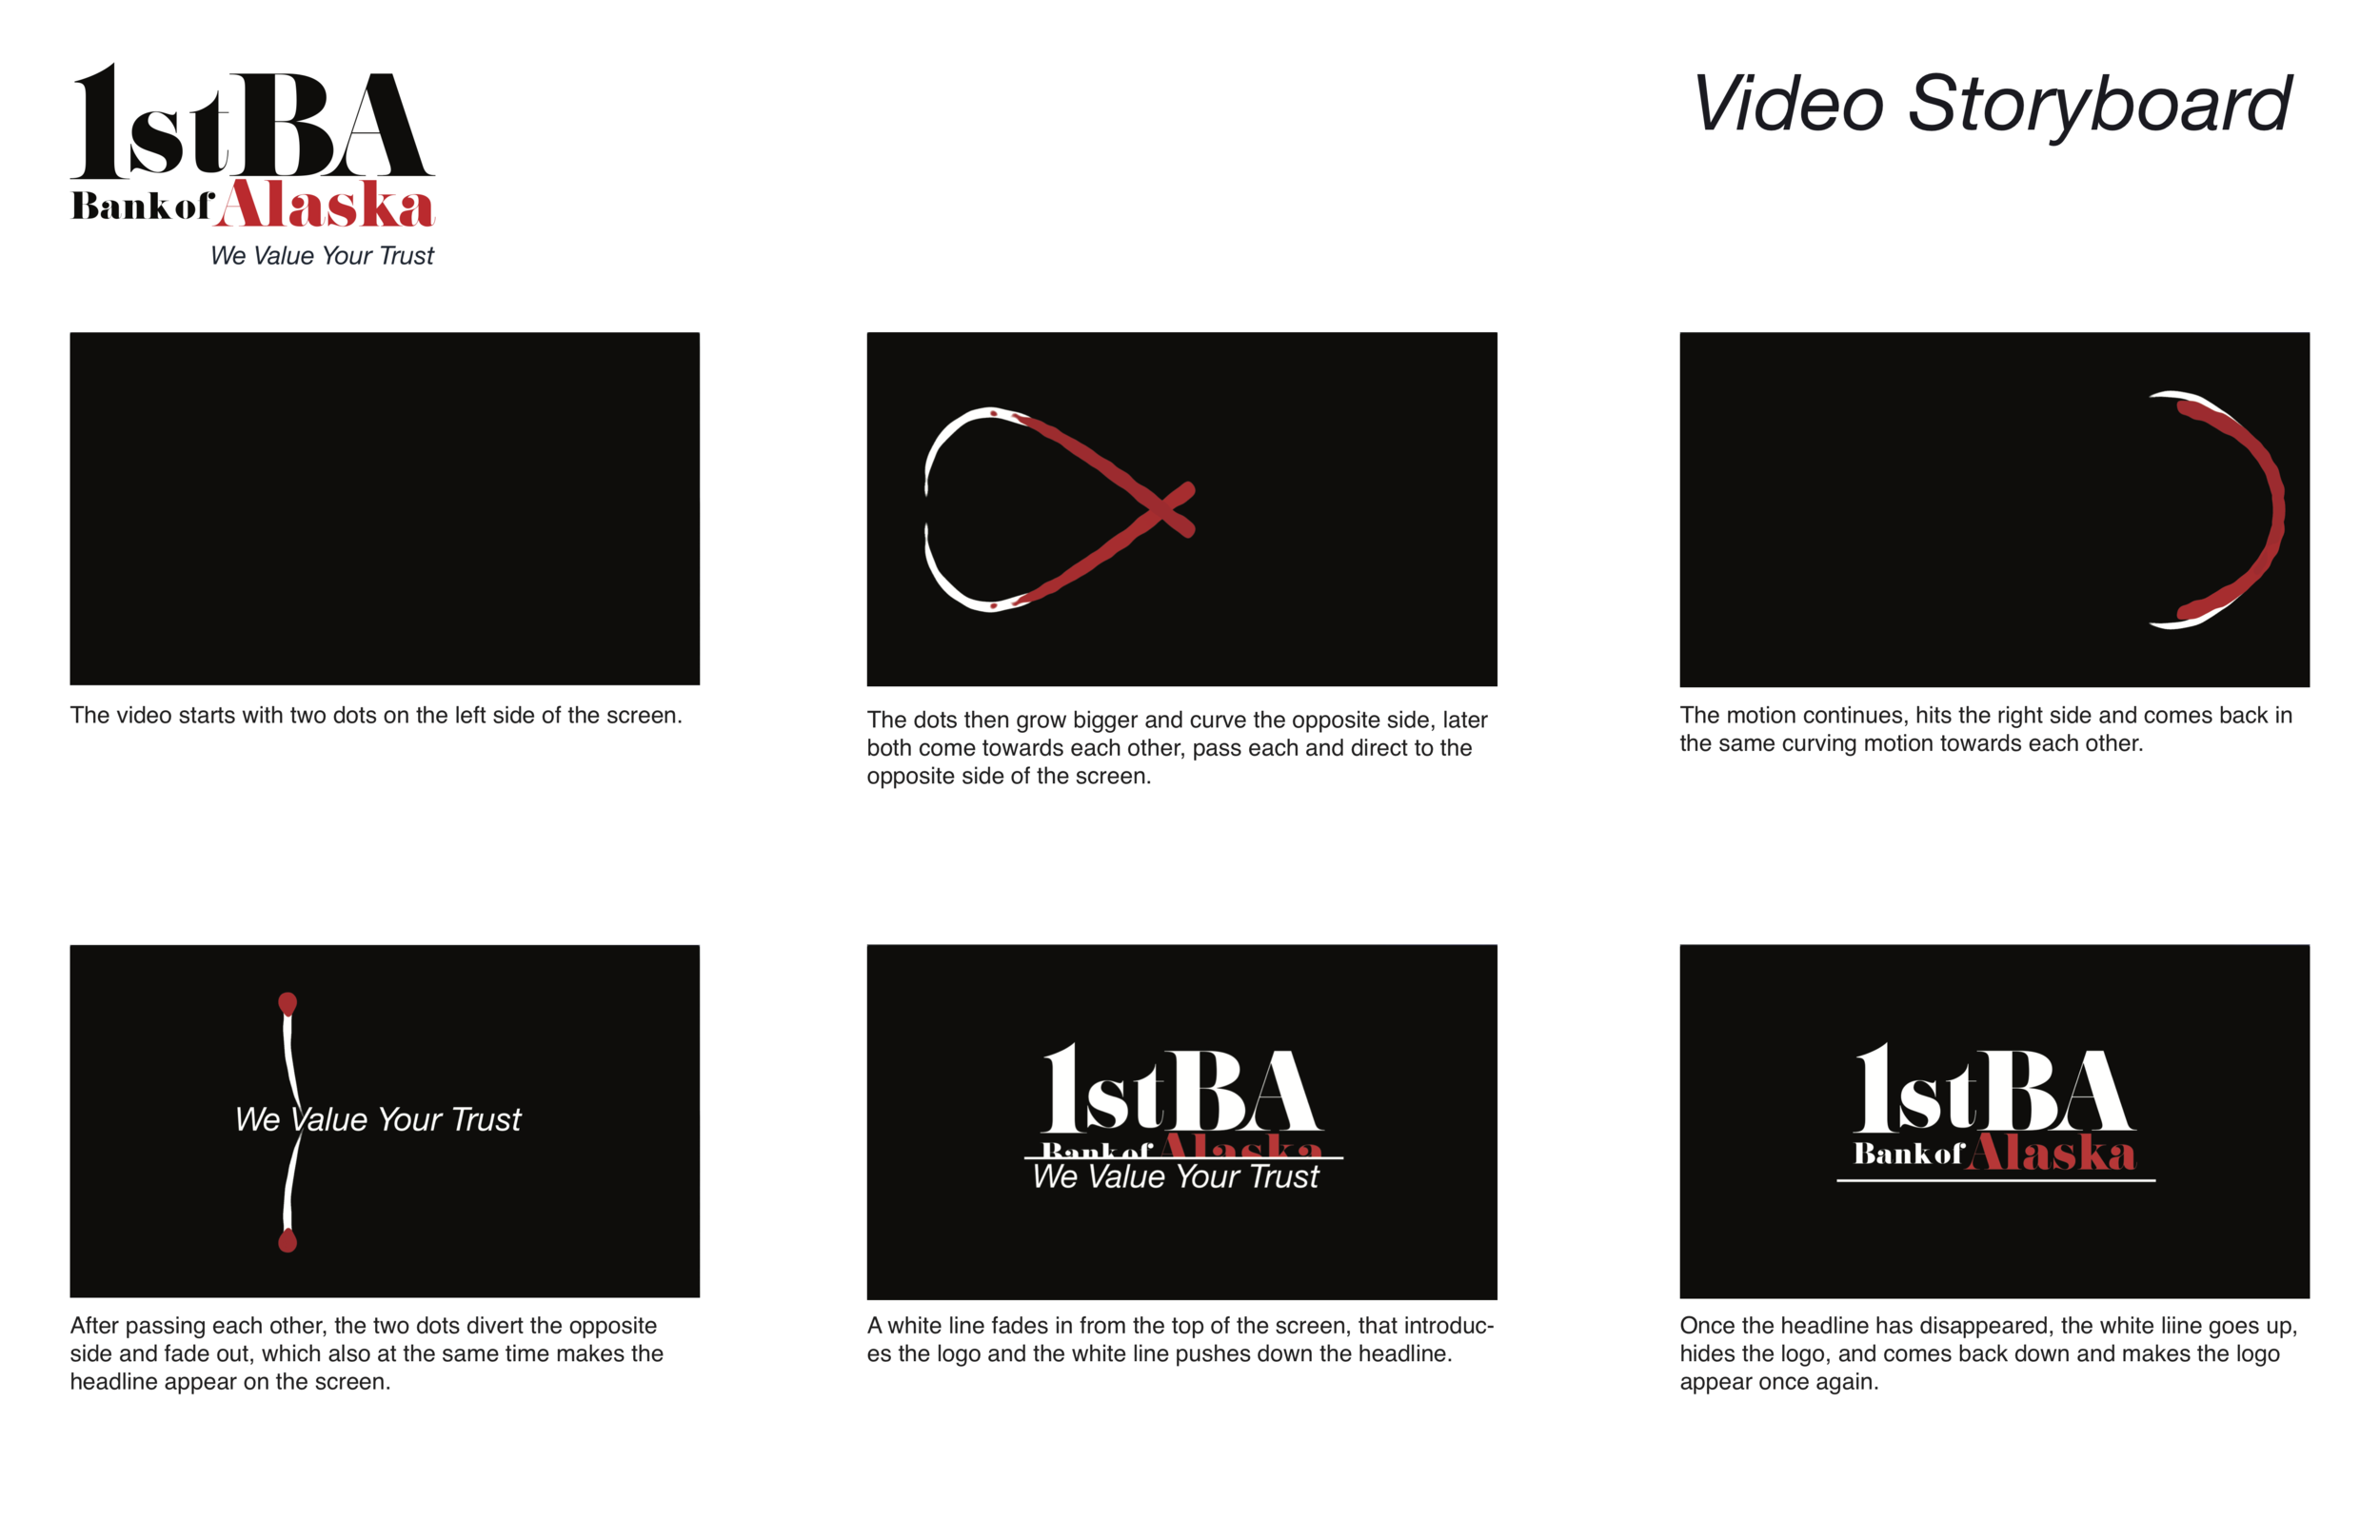 VideoStoryboard.png